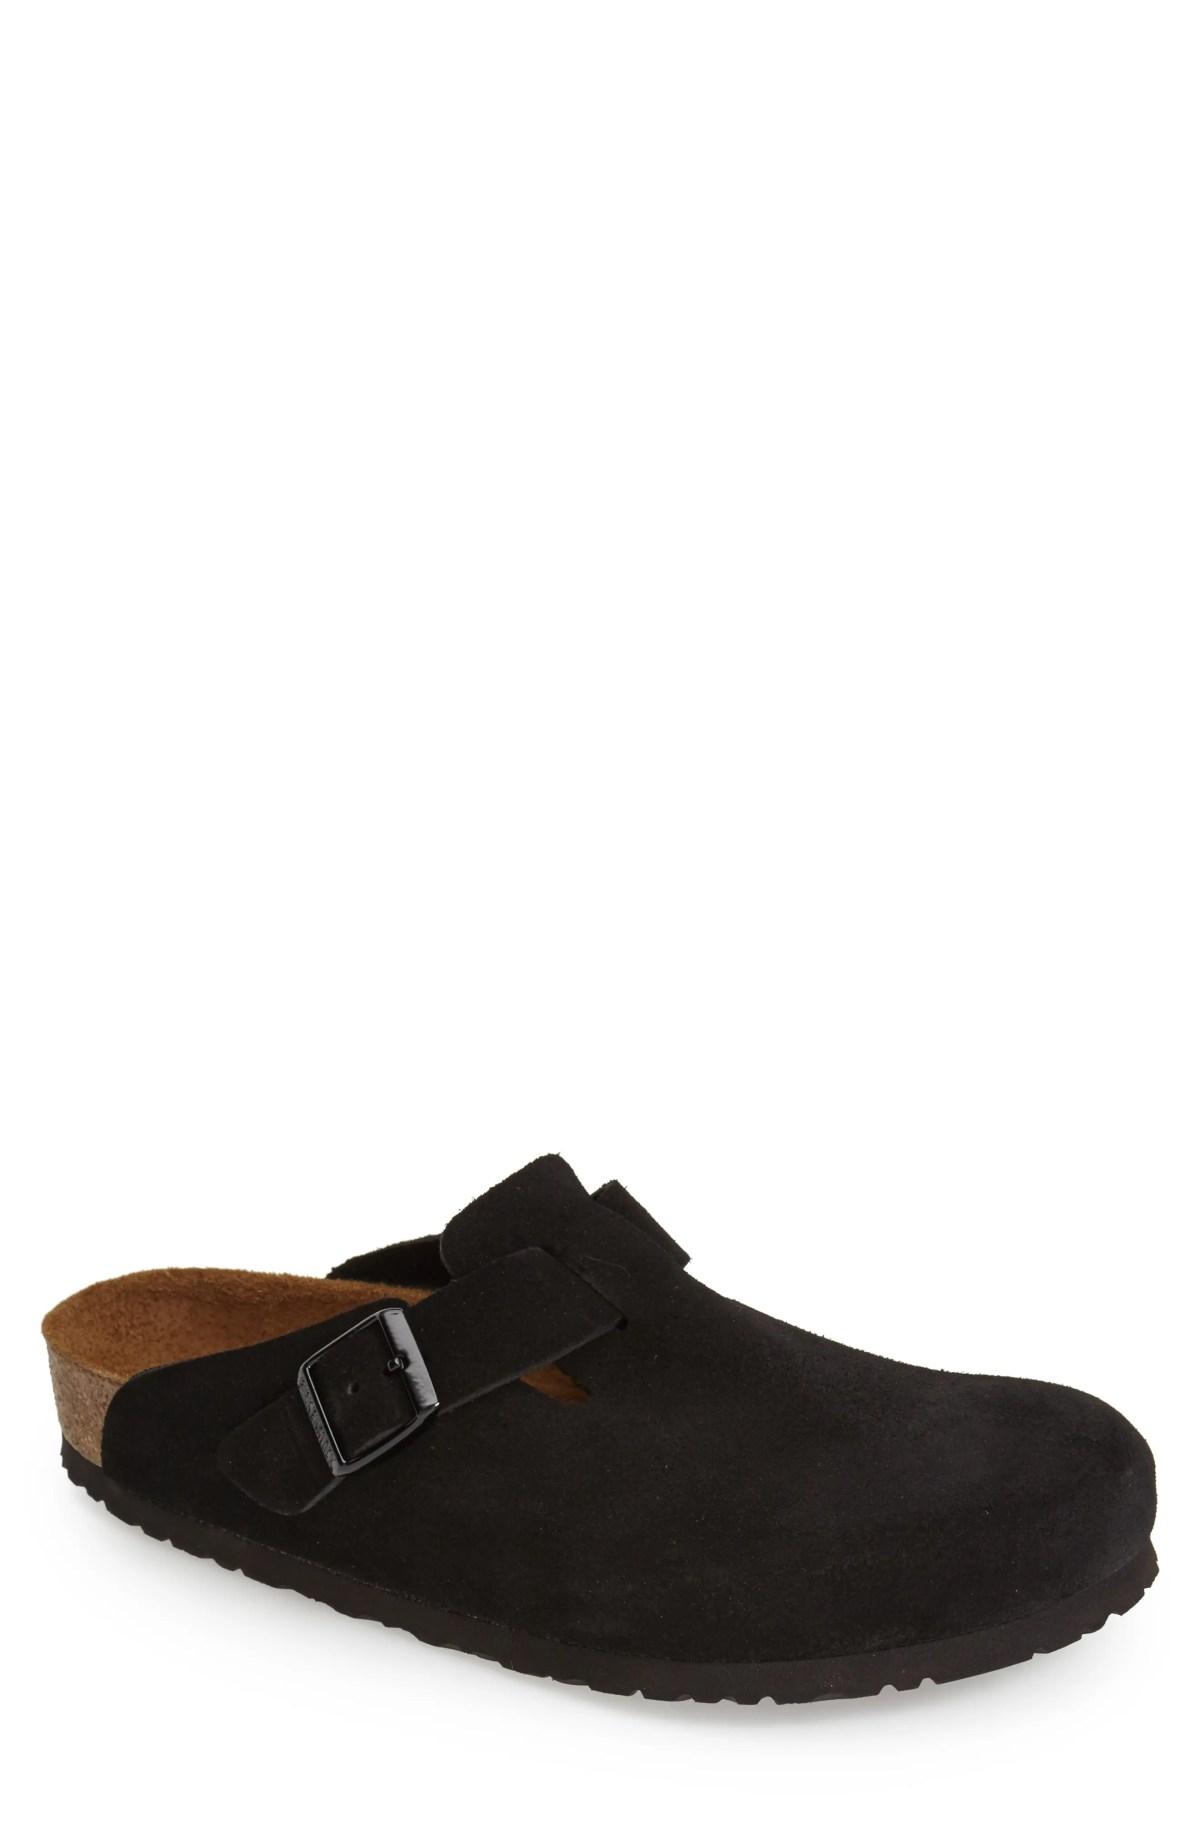 BIRKENSTOCK 'Boston Soft' Suede Clog, Main, color, BLACK